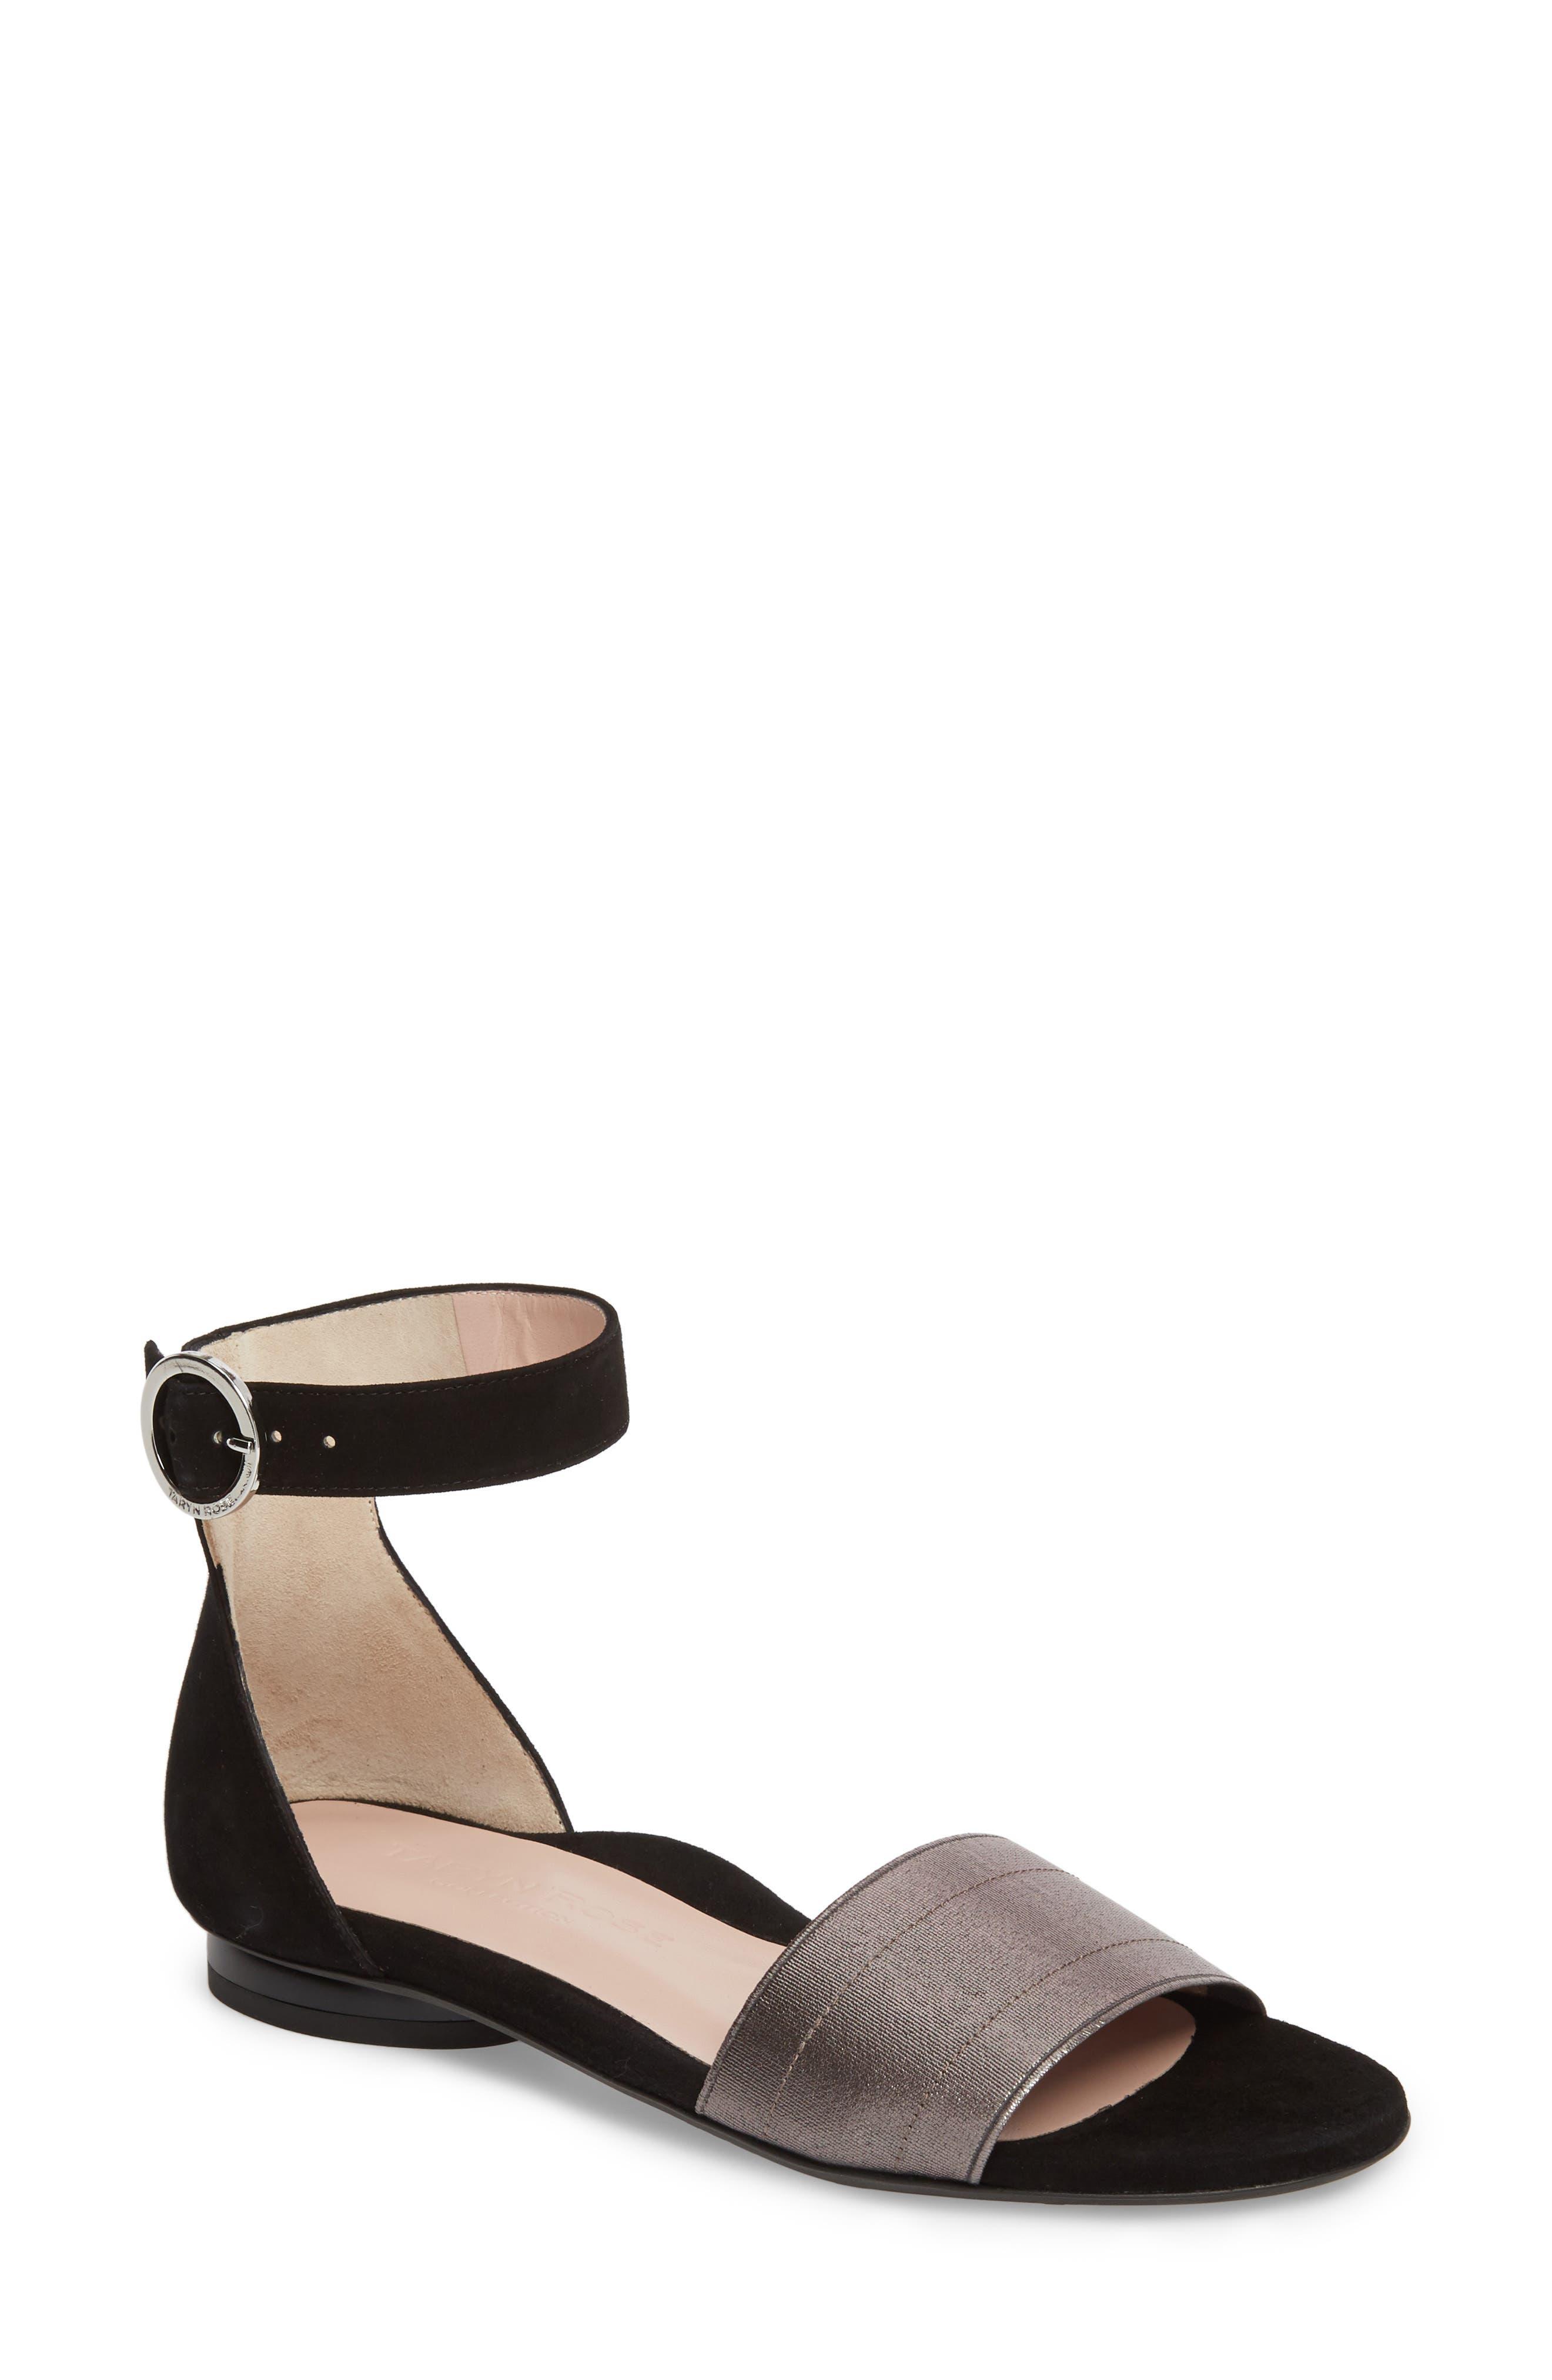 Taryn Rose Collection Donati Ankle Strap Sandal- Black